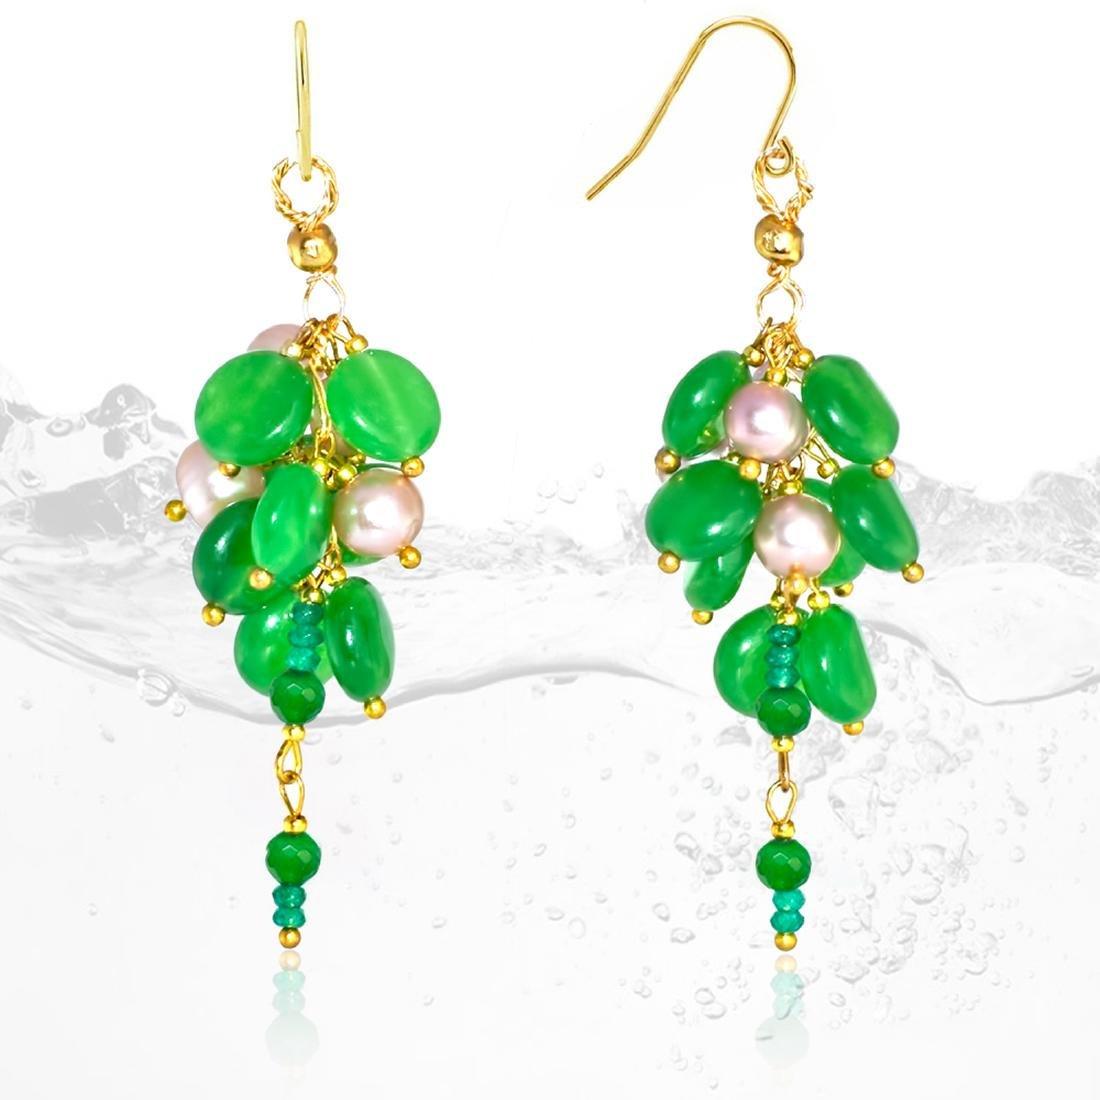 14K 'Cluster' Earrings with Imperial Jadeite Jade and